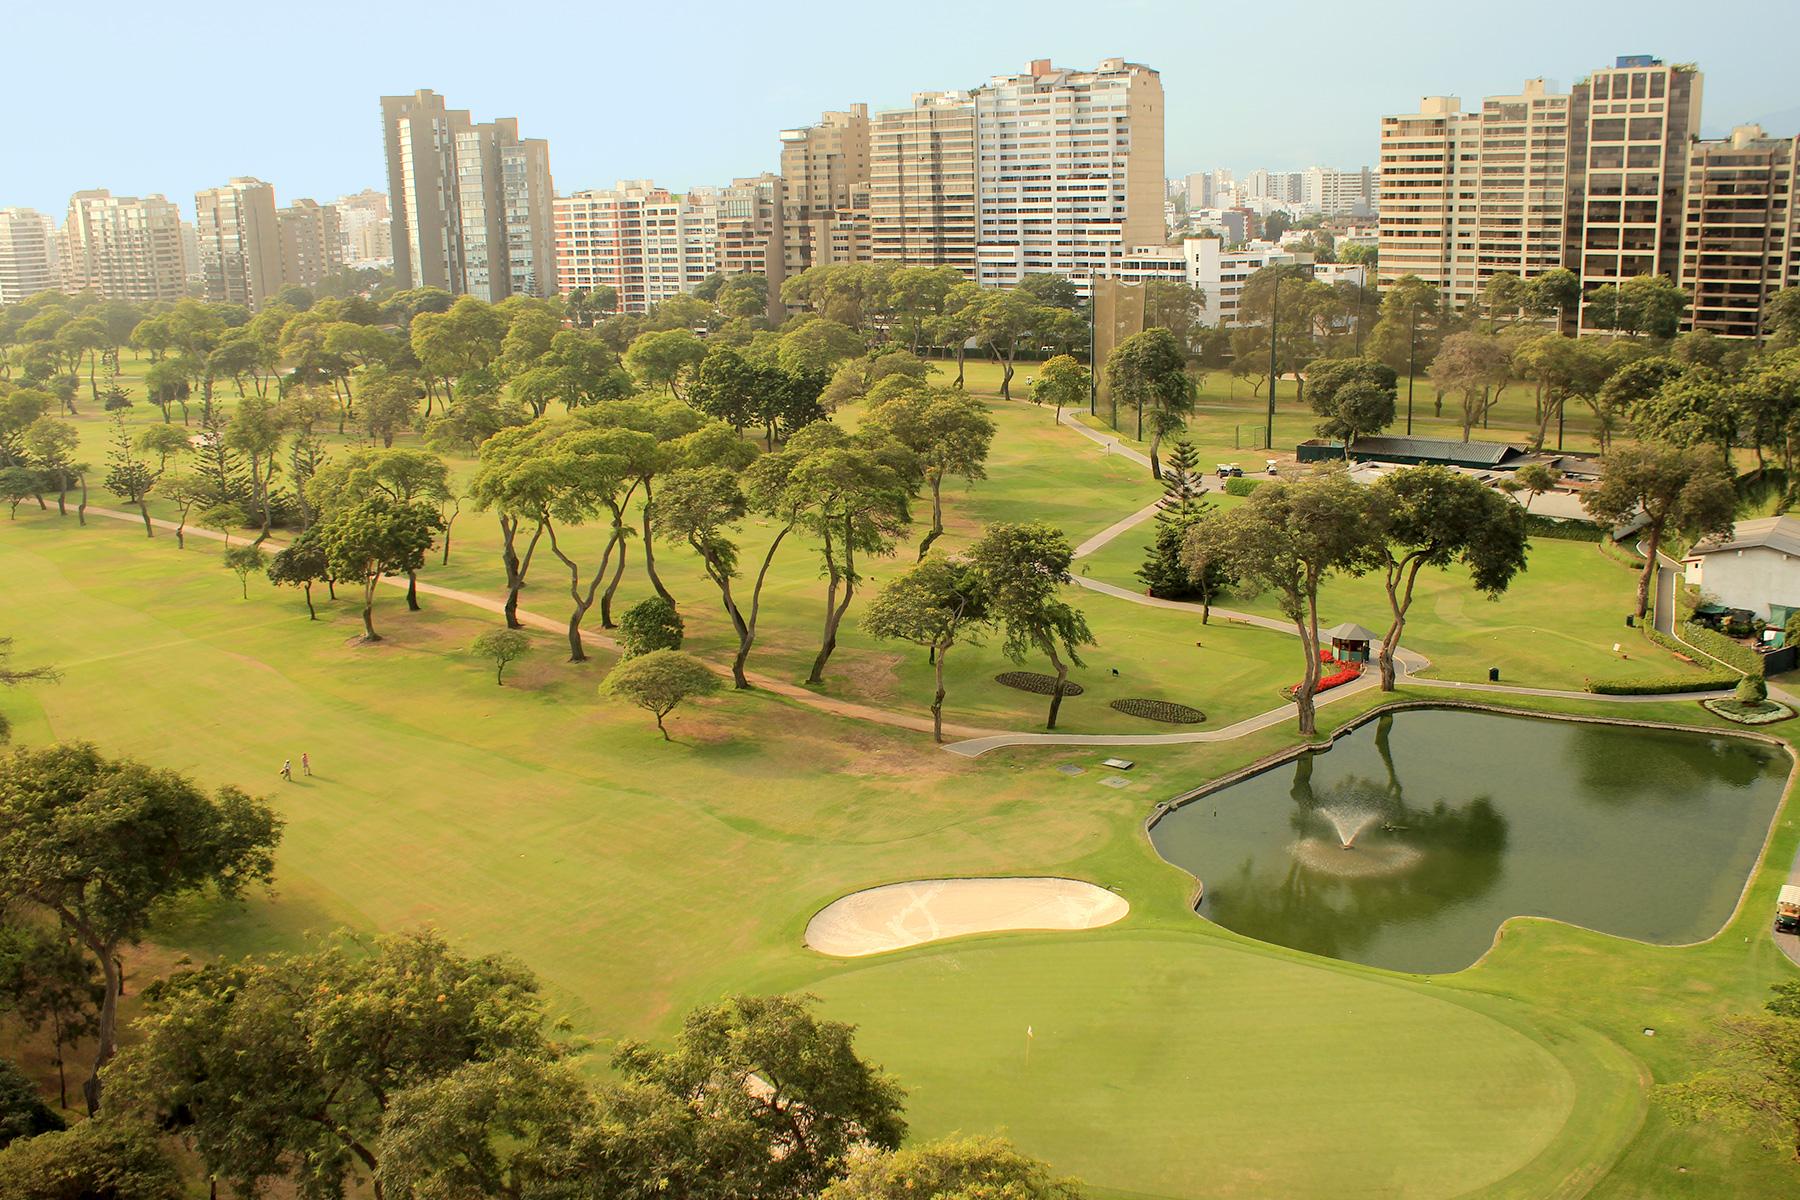 Apartment for Sale at Lujoso departamento Frente al golf en Exclusivo Edificio Av. Juan Antonio Pezet San Isidro, Lima, 27 Peru